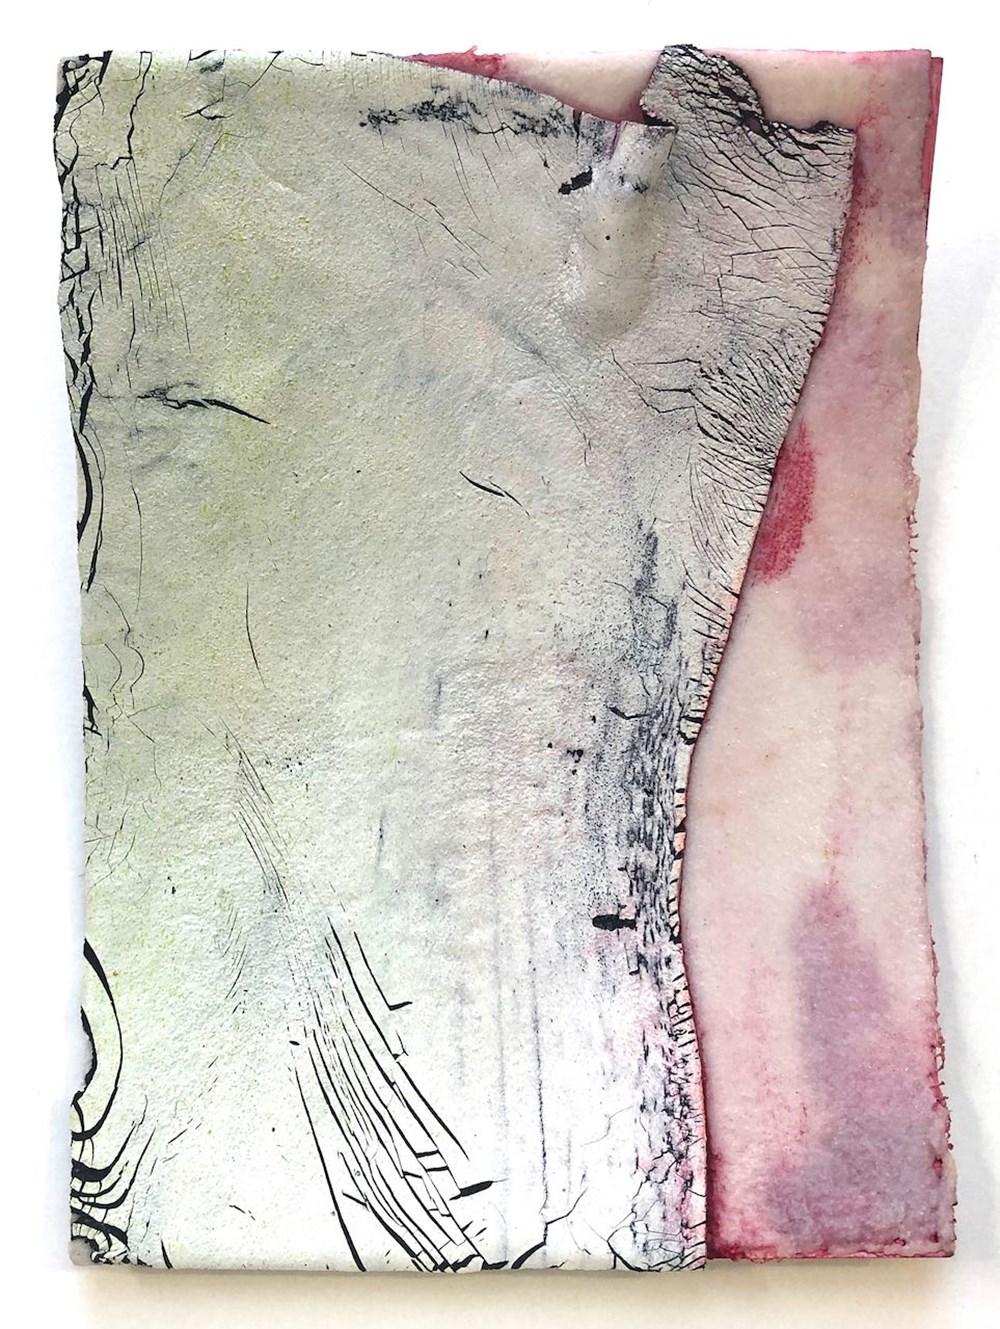 Life on Venus III | The Organic, Timed Auction - Lot 31, Monica Perez Vega, Untitled (bark)